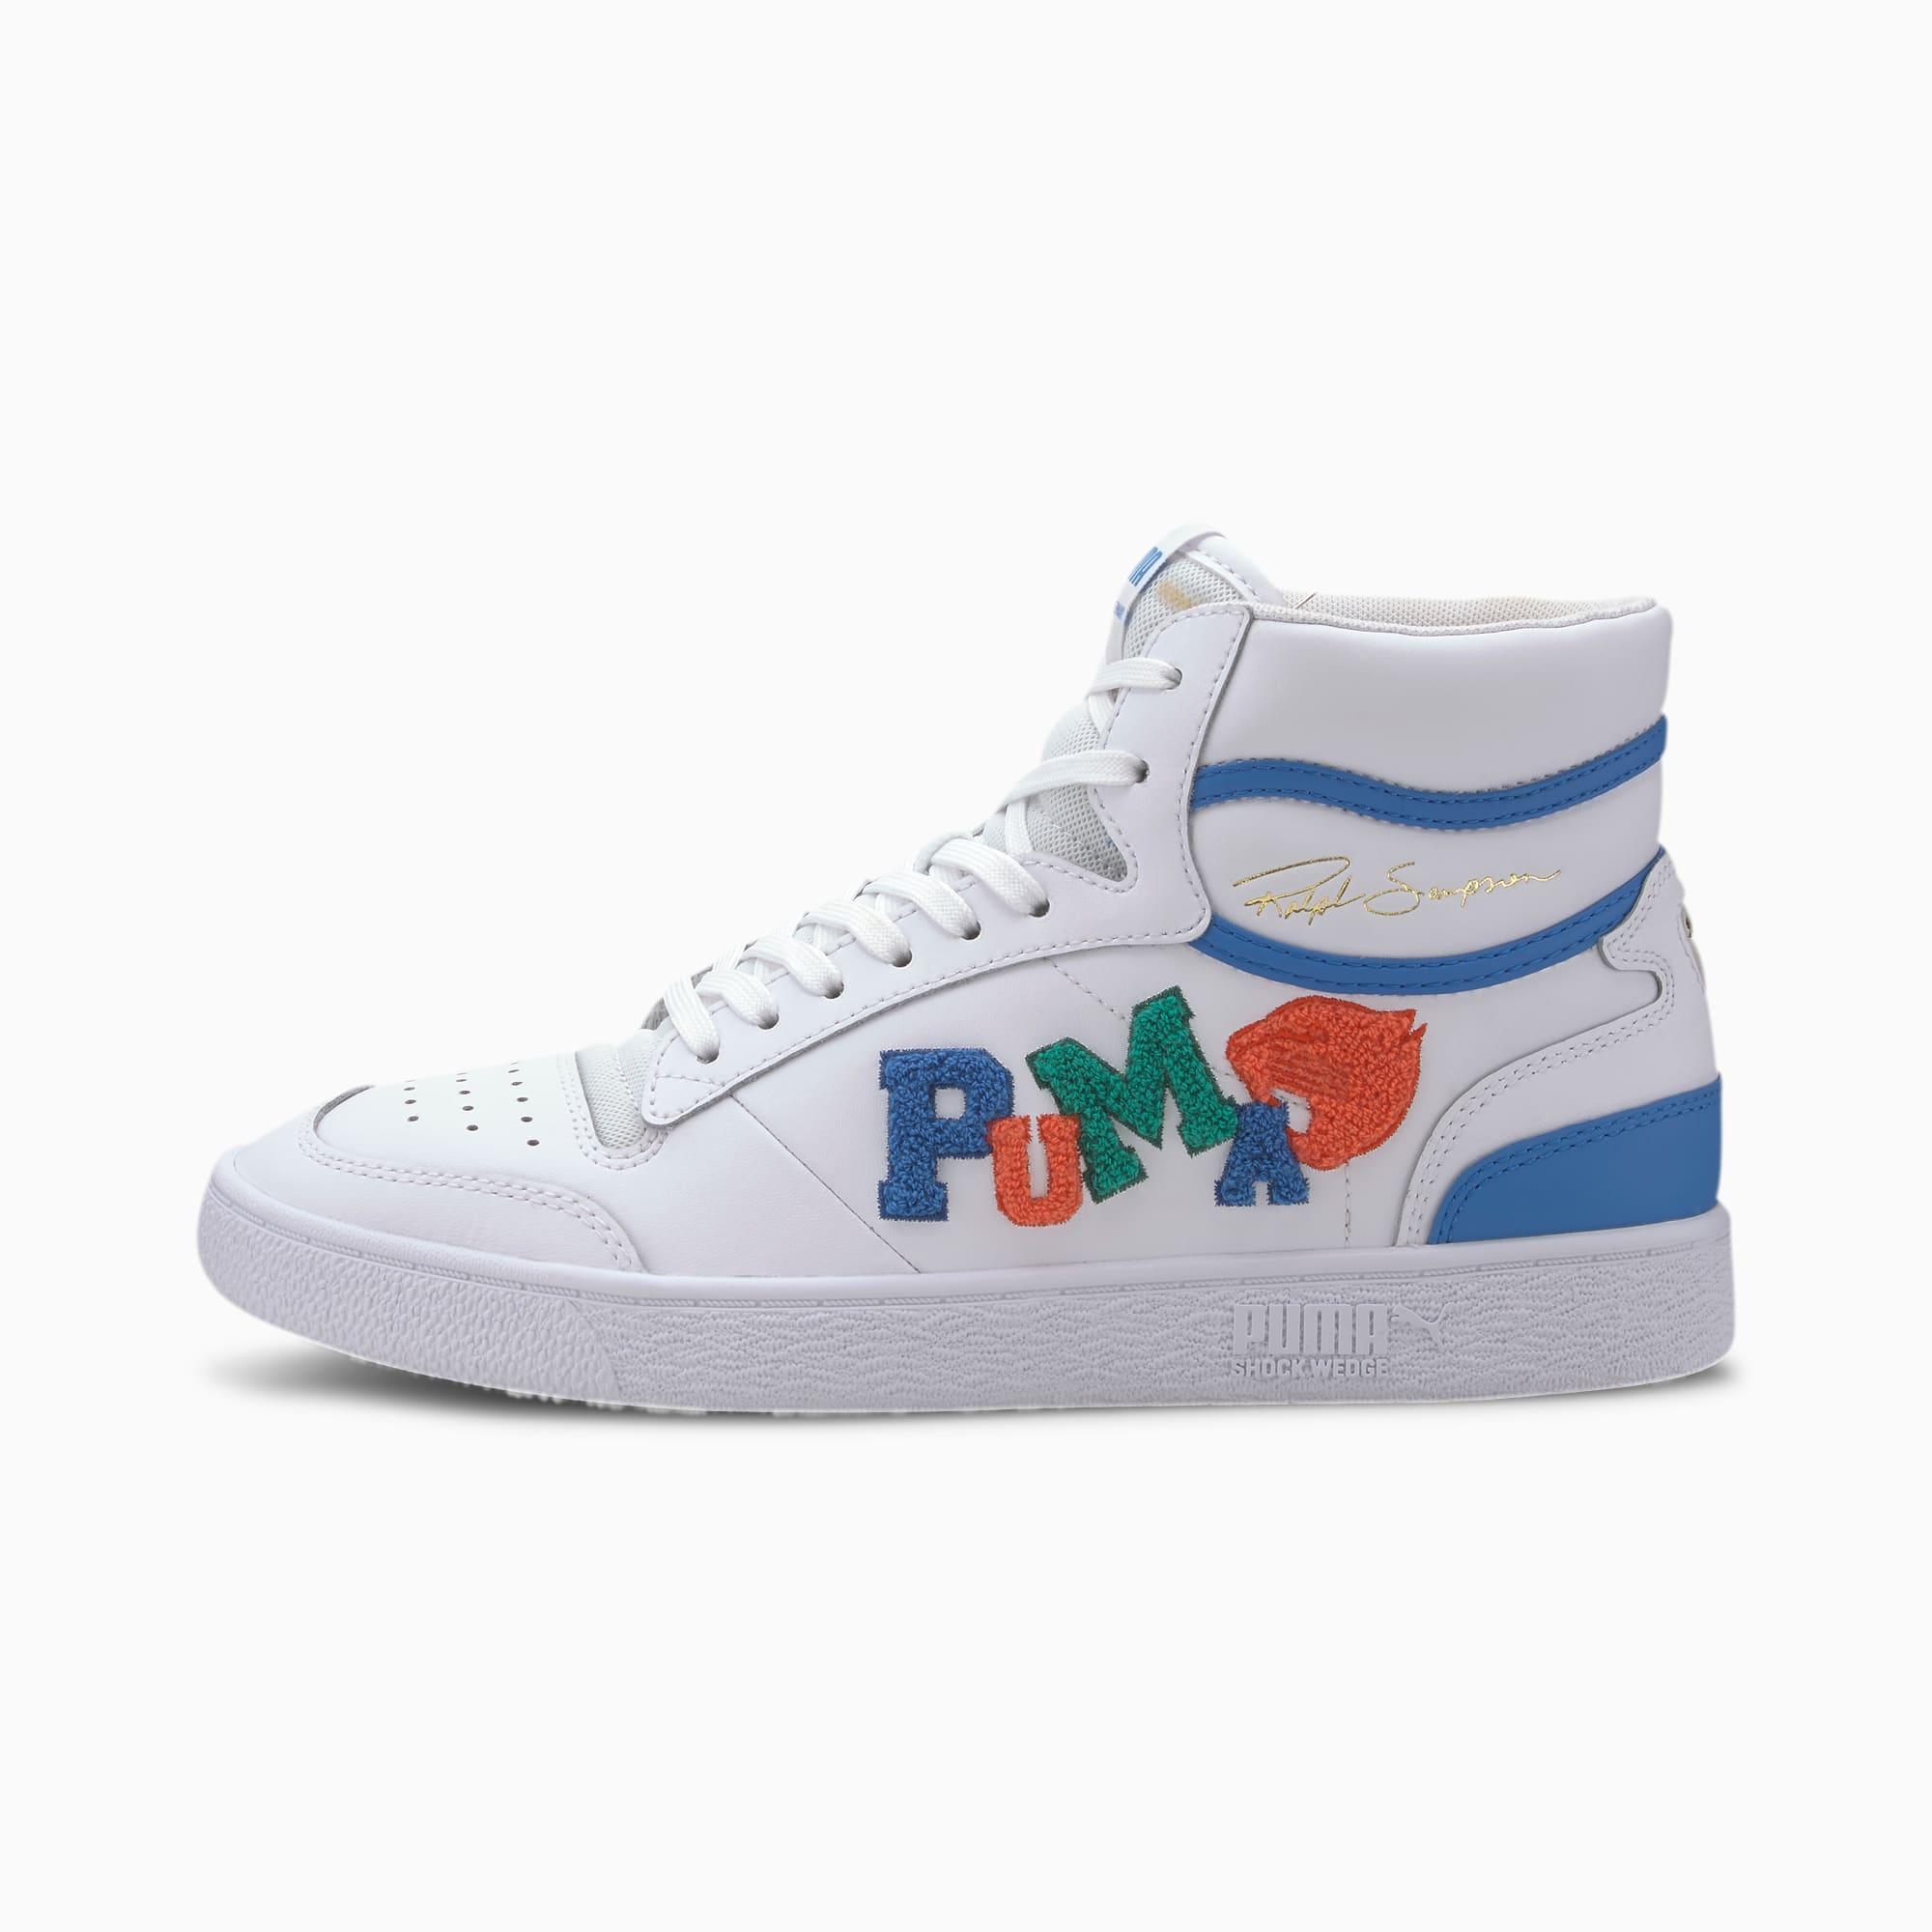 chaussure basket ralph sampson mid badges, blanc/bleu, taille 41, chaussures